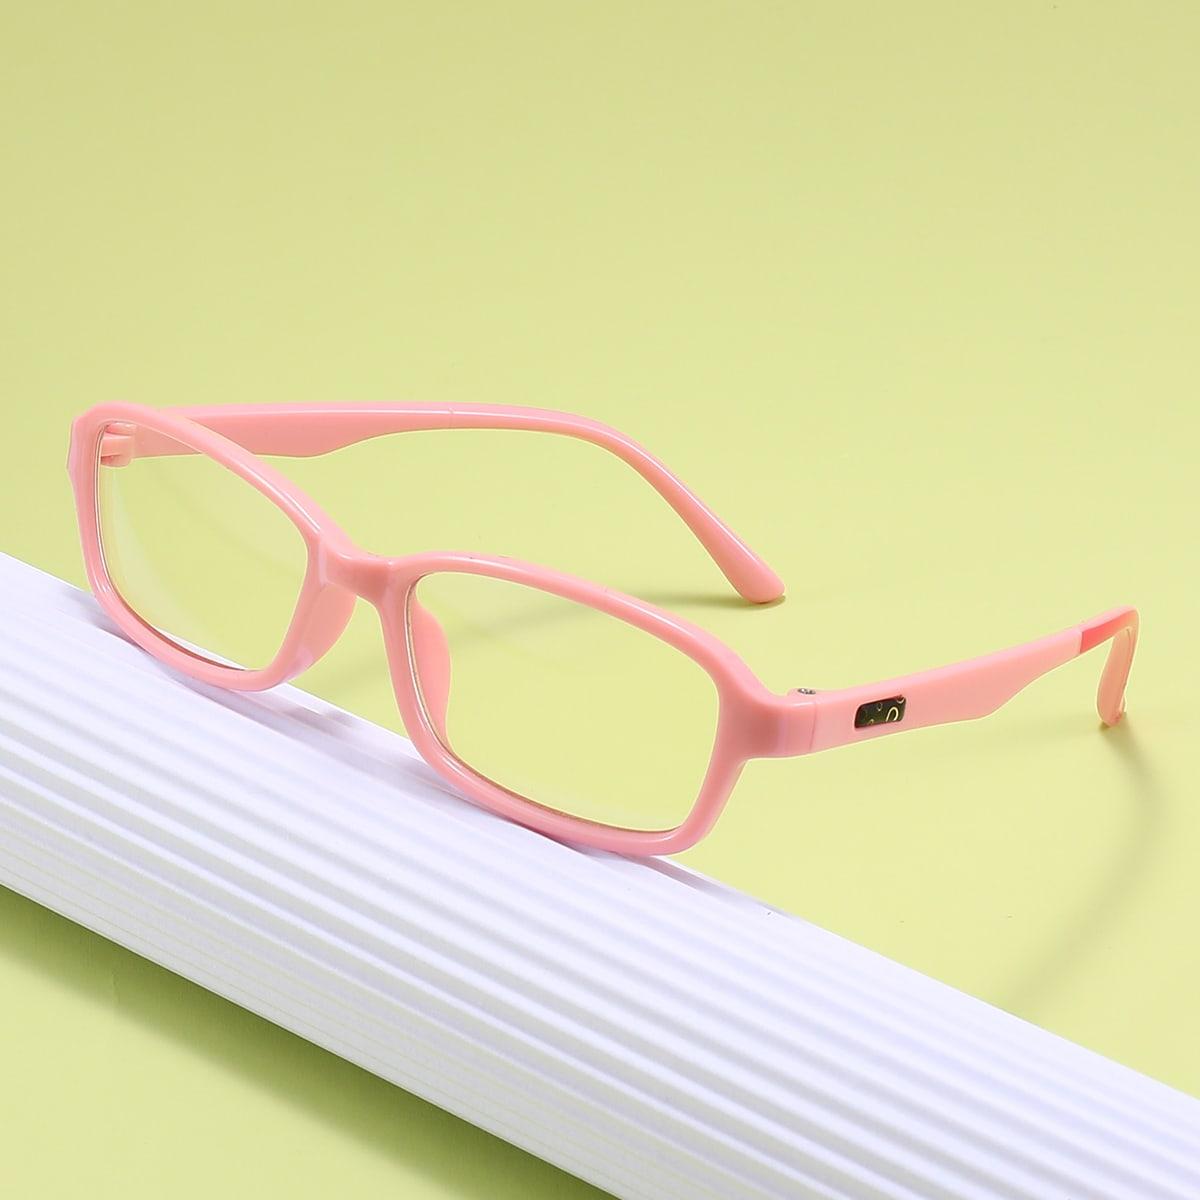 Детские очки с защитой от синего света в геометрической оправе